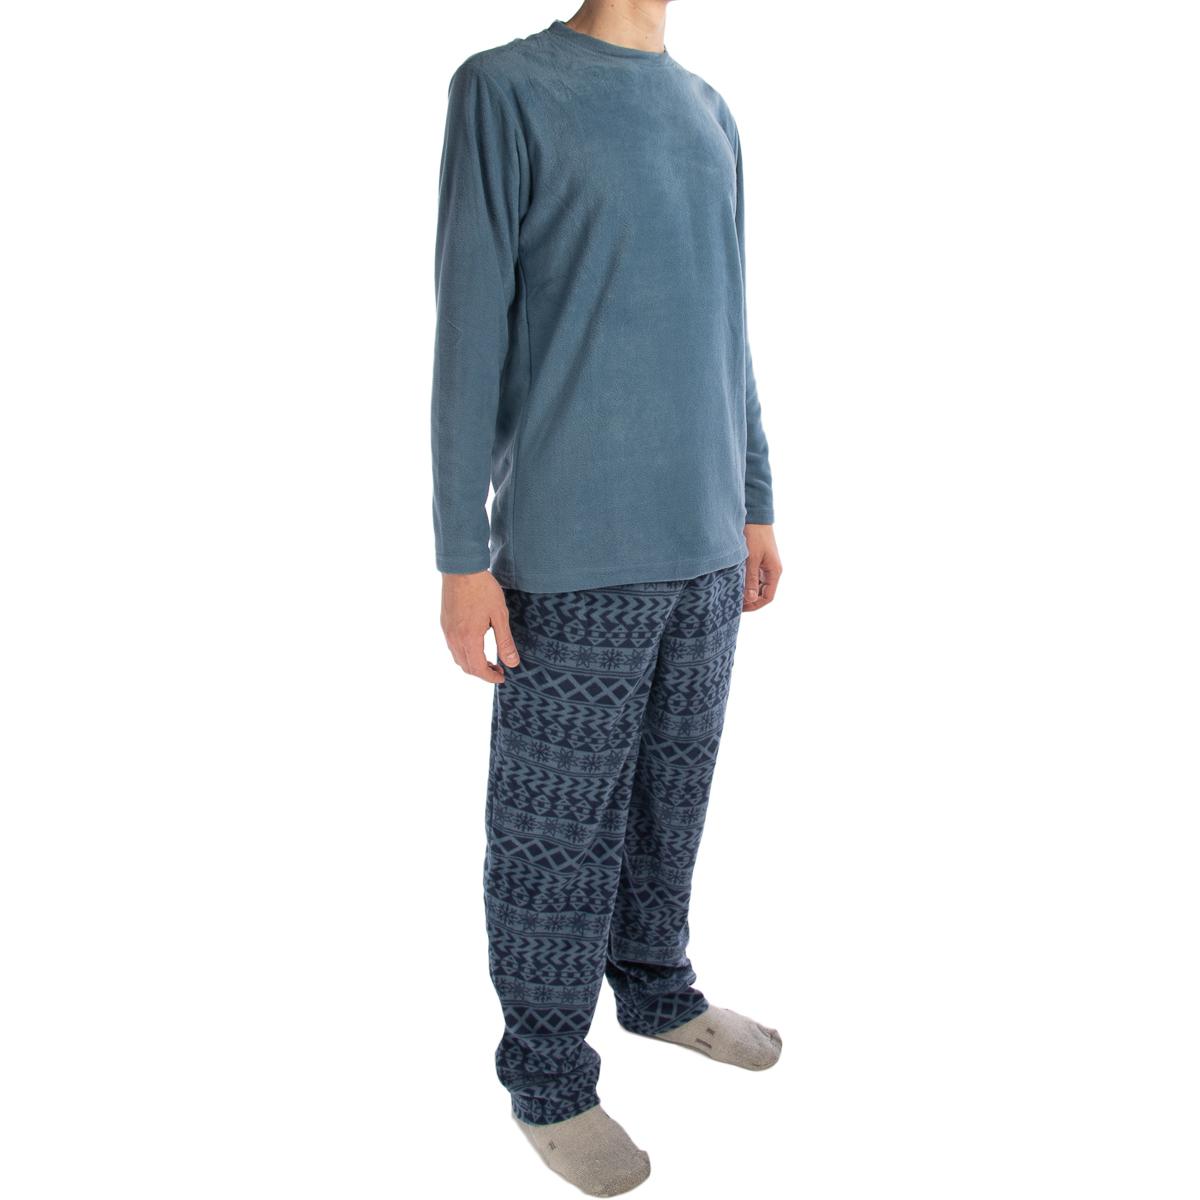 2pc Joe Boxer Men's Fleece Pajamas Set Shirt /& Pants PJ Sleepwear Top /& Bottom